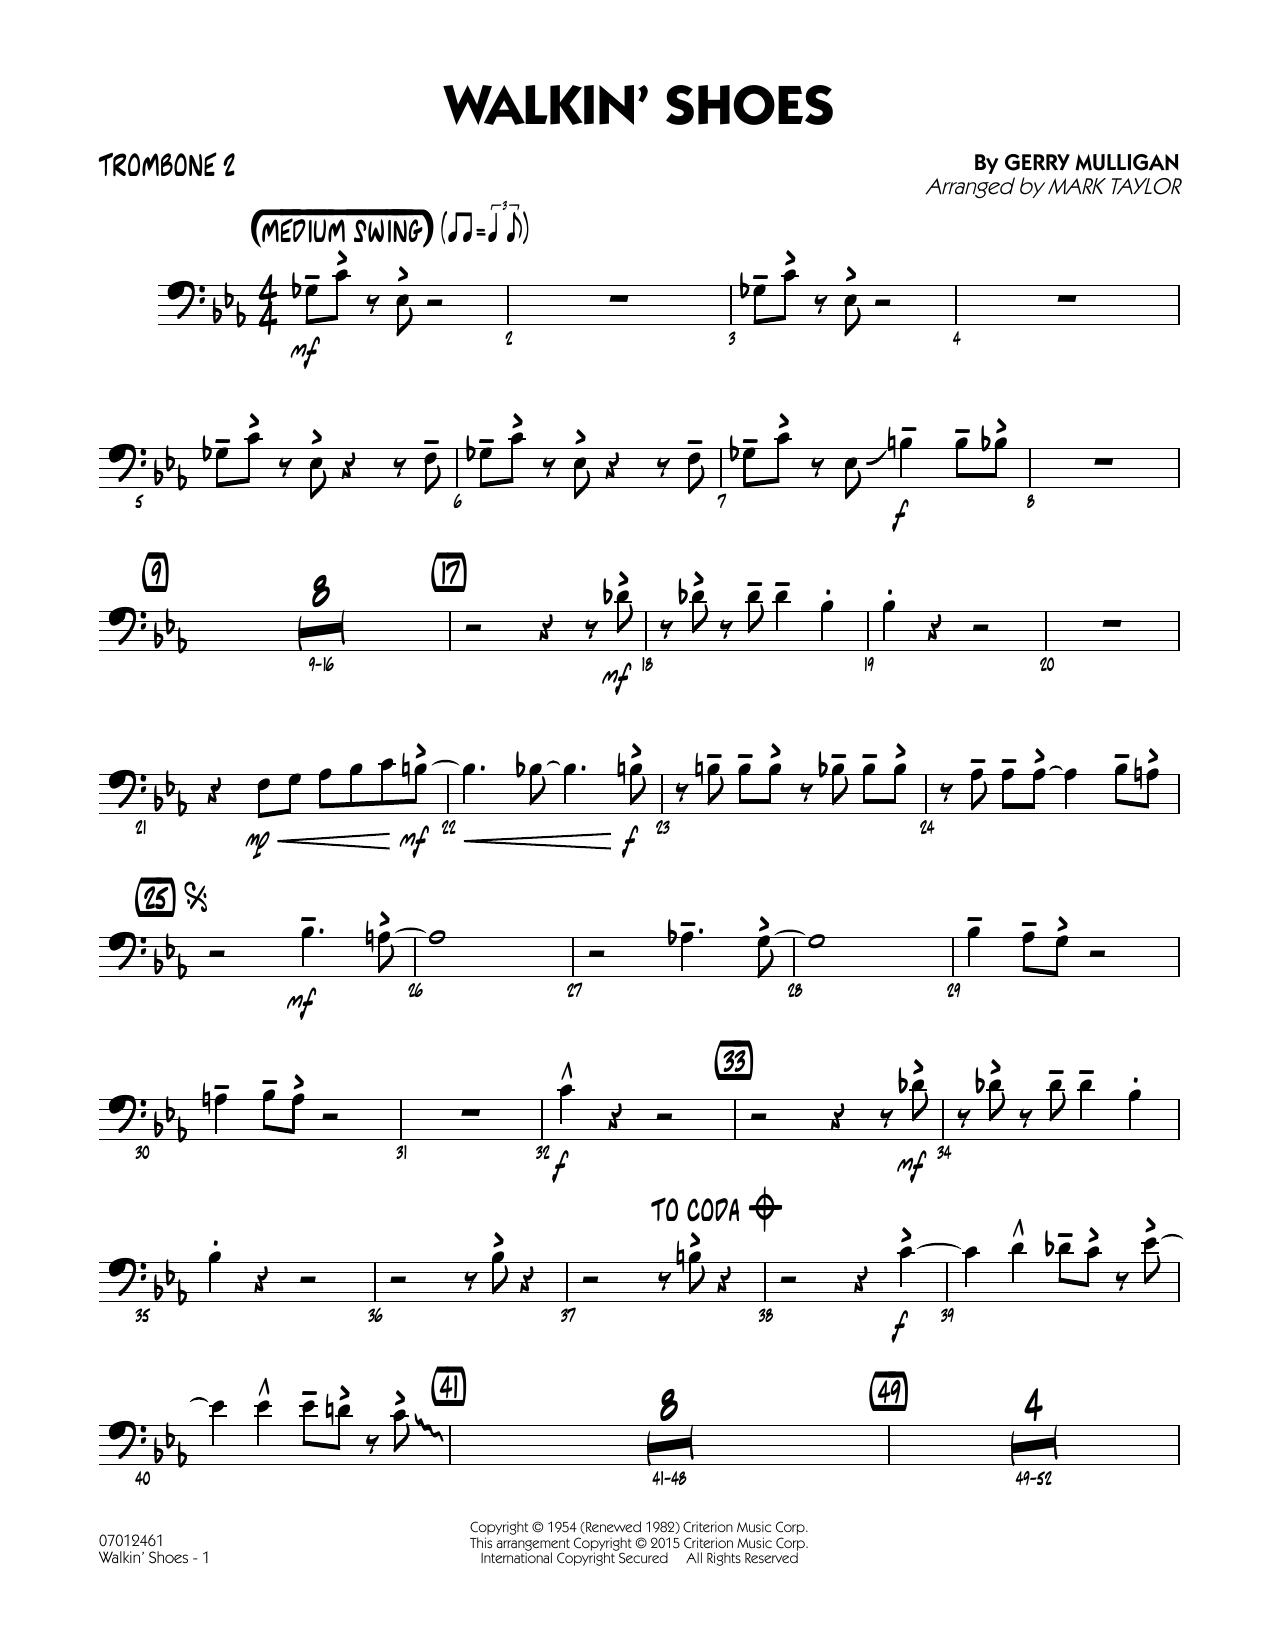 Mark Taylor Walkin' Shoes - Trombone 2 sheet music notes and chords. Download Printable PDF.